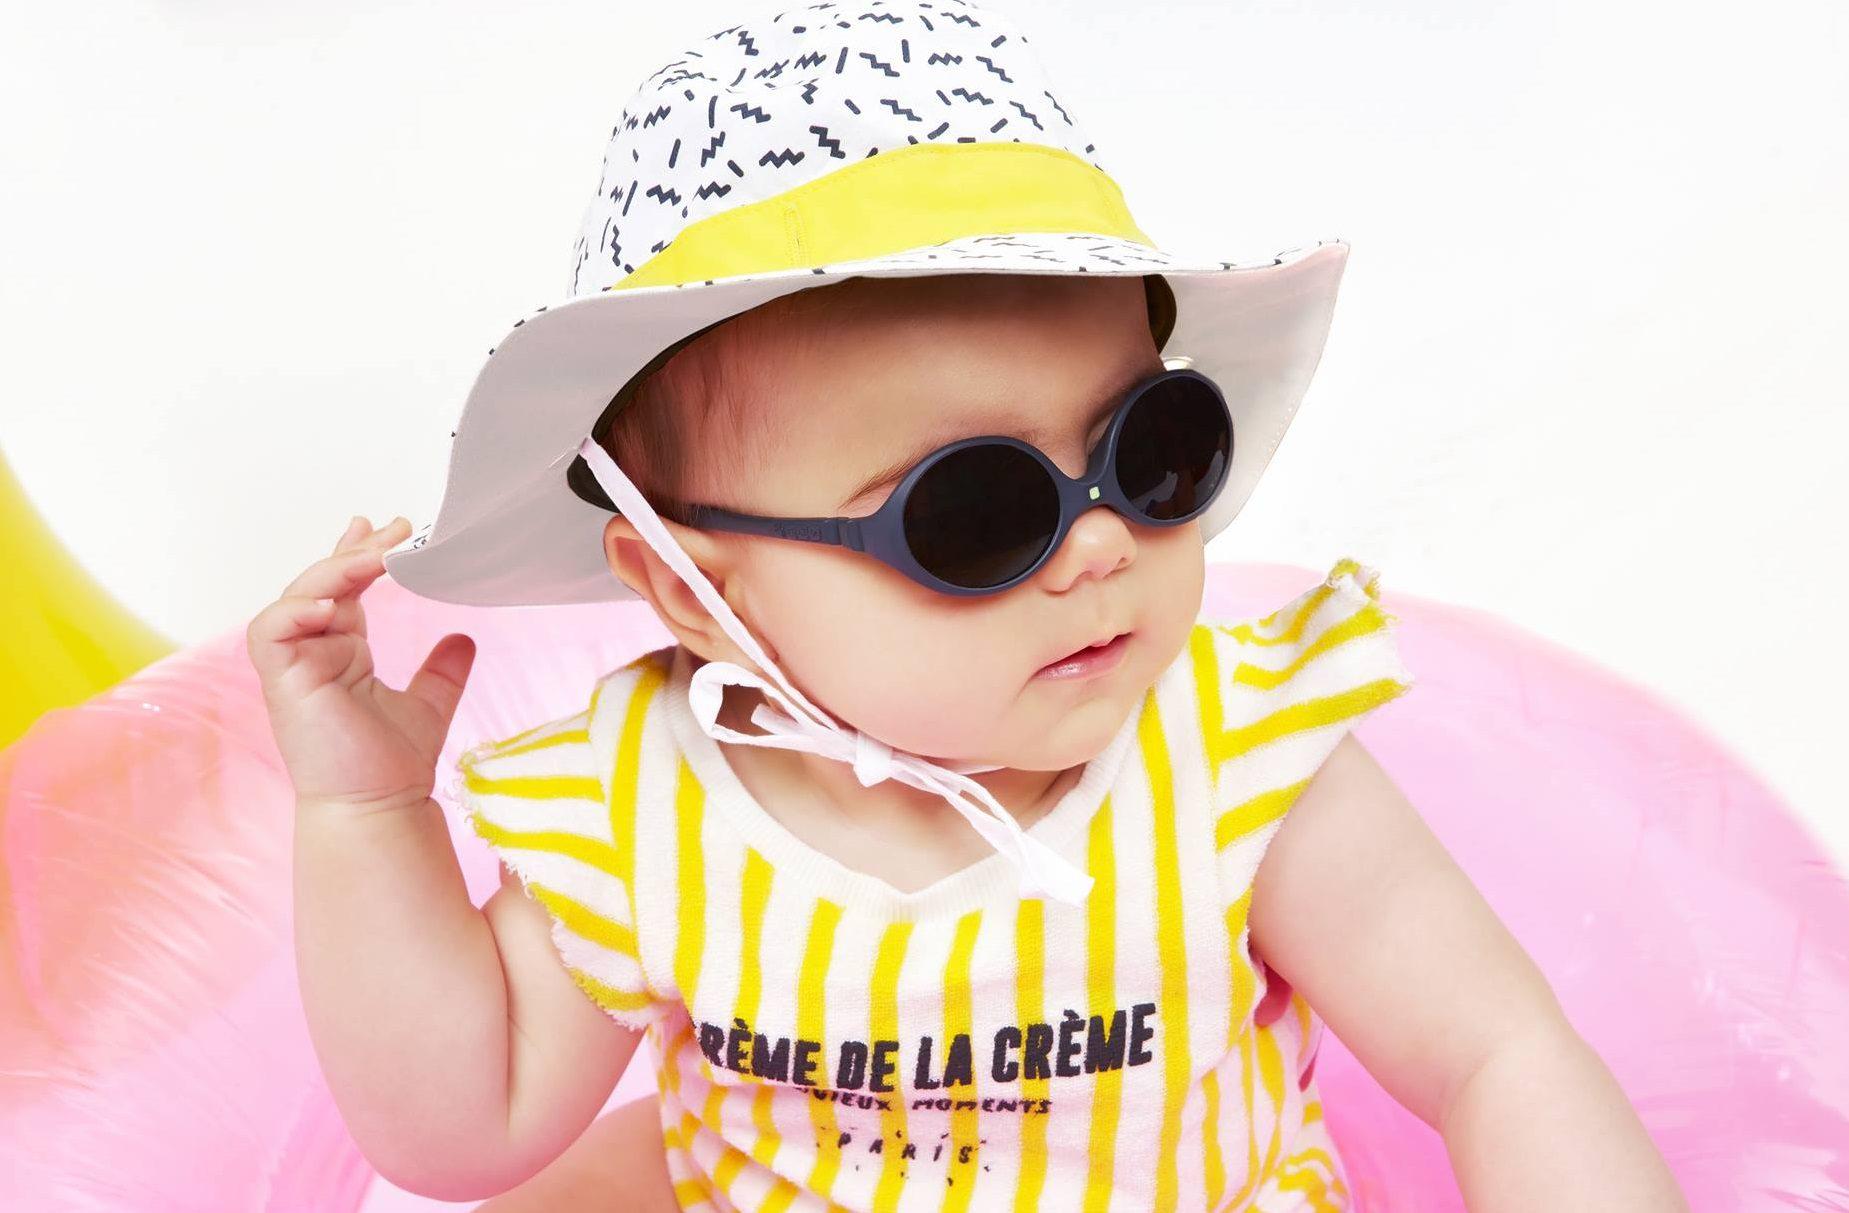 Kietla sunčane naočale i šeširići